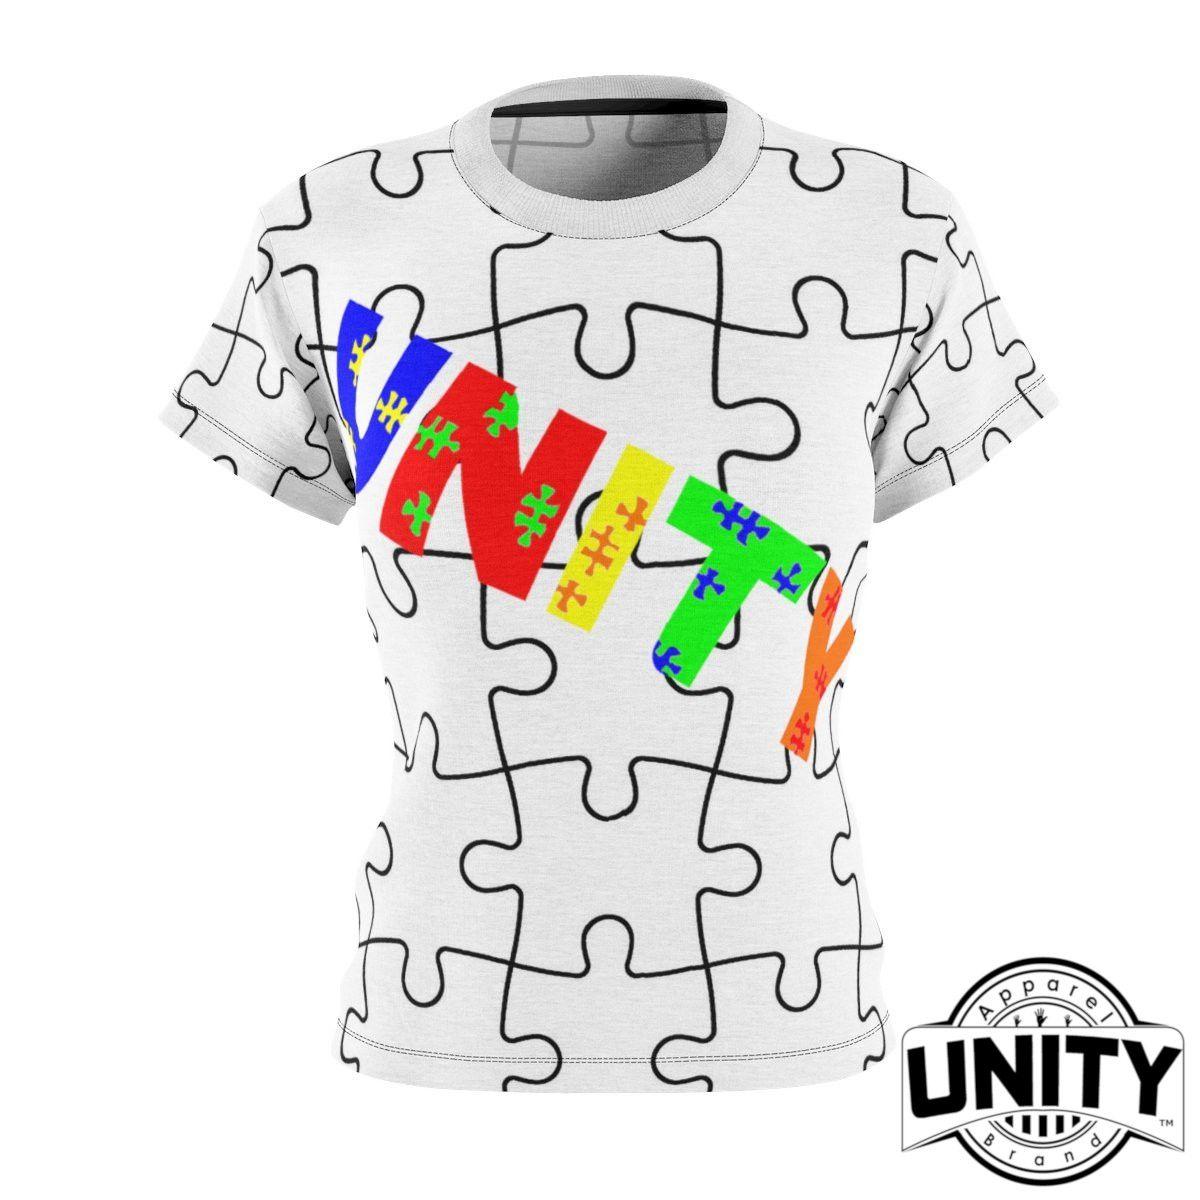 a5c6d6c9675 Women's Fashion Autism awareness clothing Women's Top Designed For Autism  Awareness charity. Unity Apparel Brand